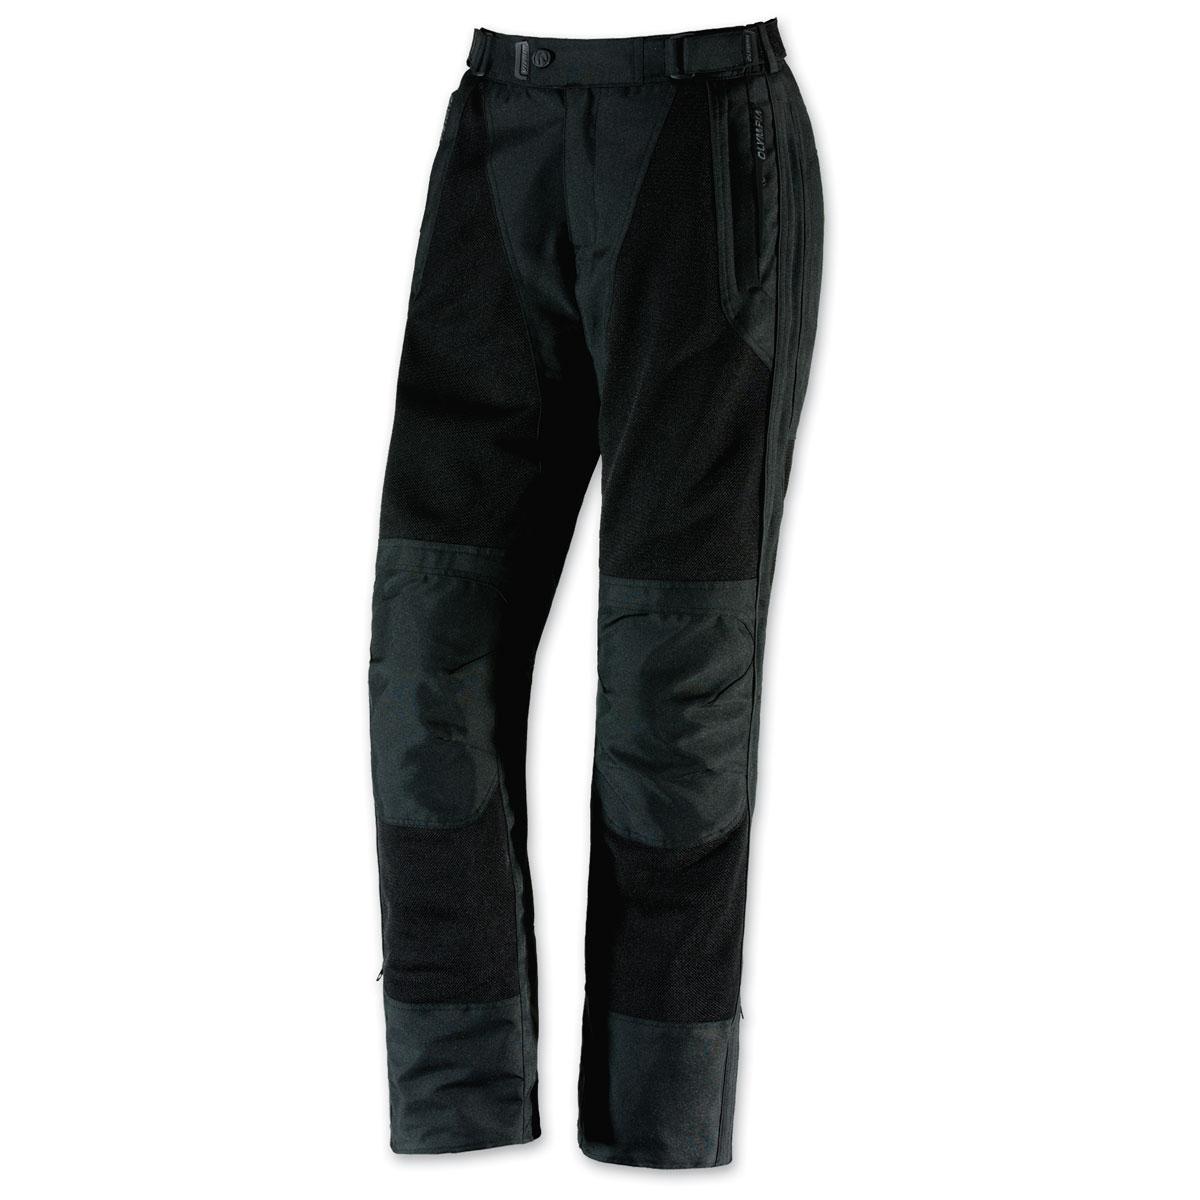 Olympia Moto Sports Women's Eve Black Pants